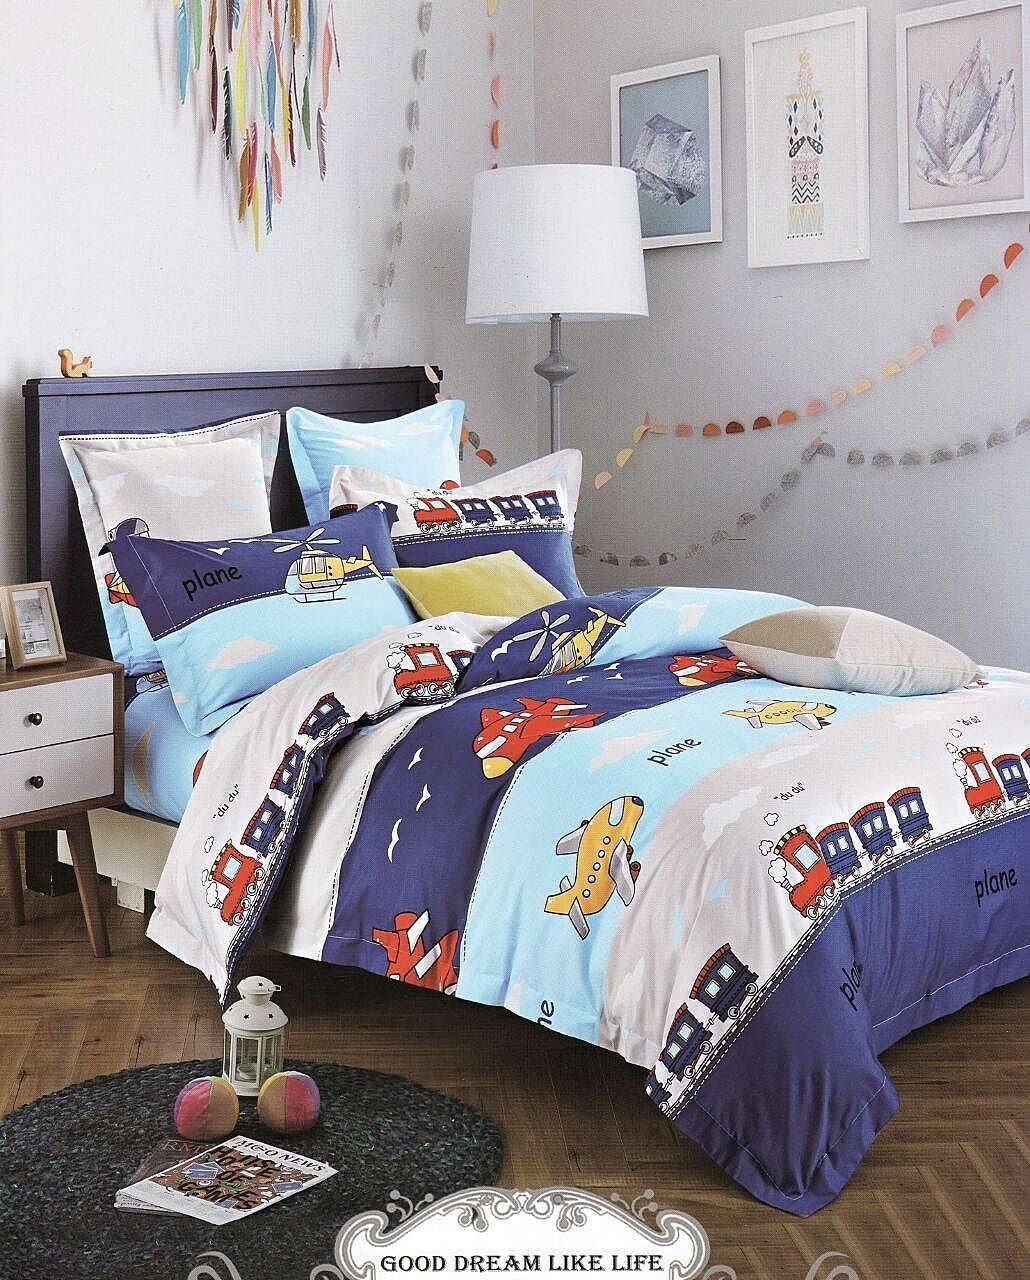 Dekorasi Kamar Tidur Minimalis Unik Dekorasi Kamar Tidur Pinterest